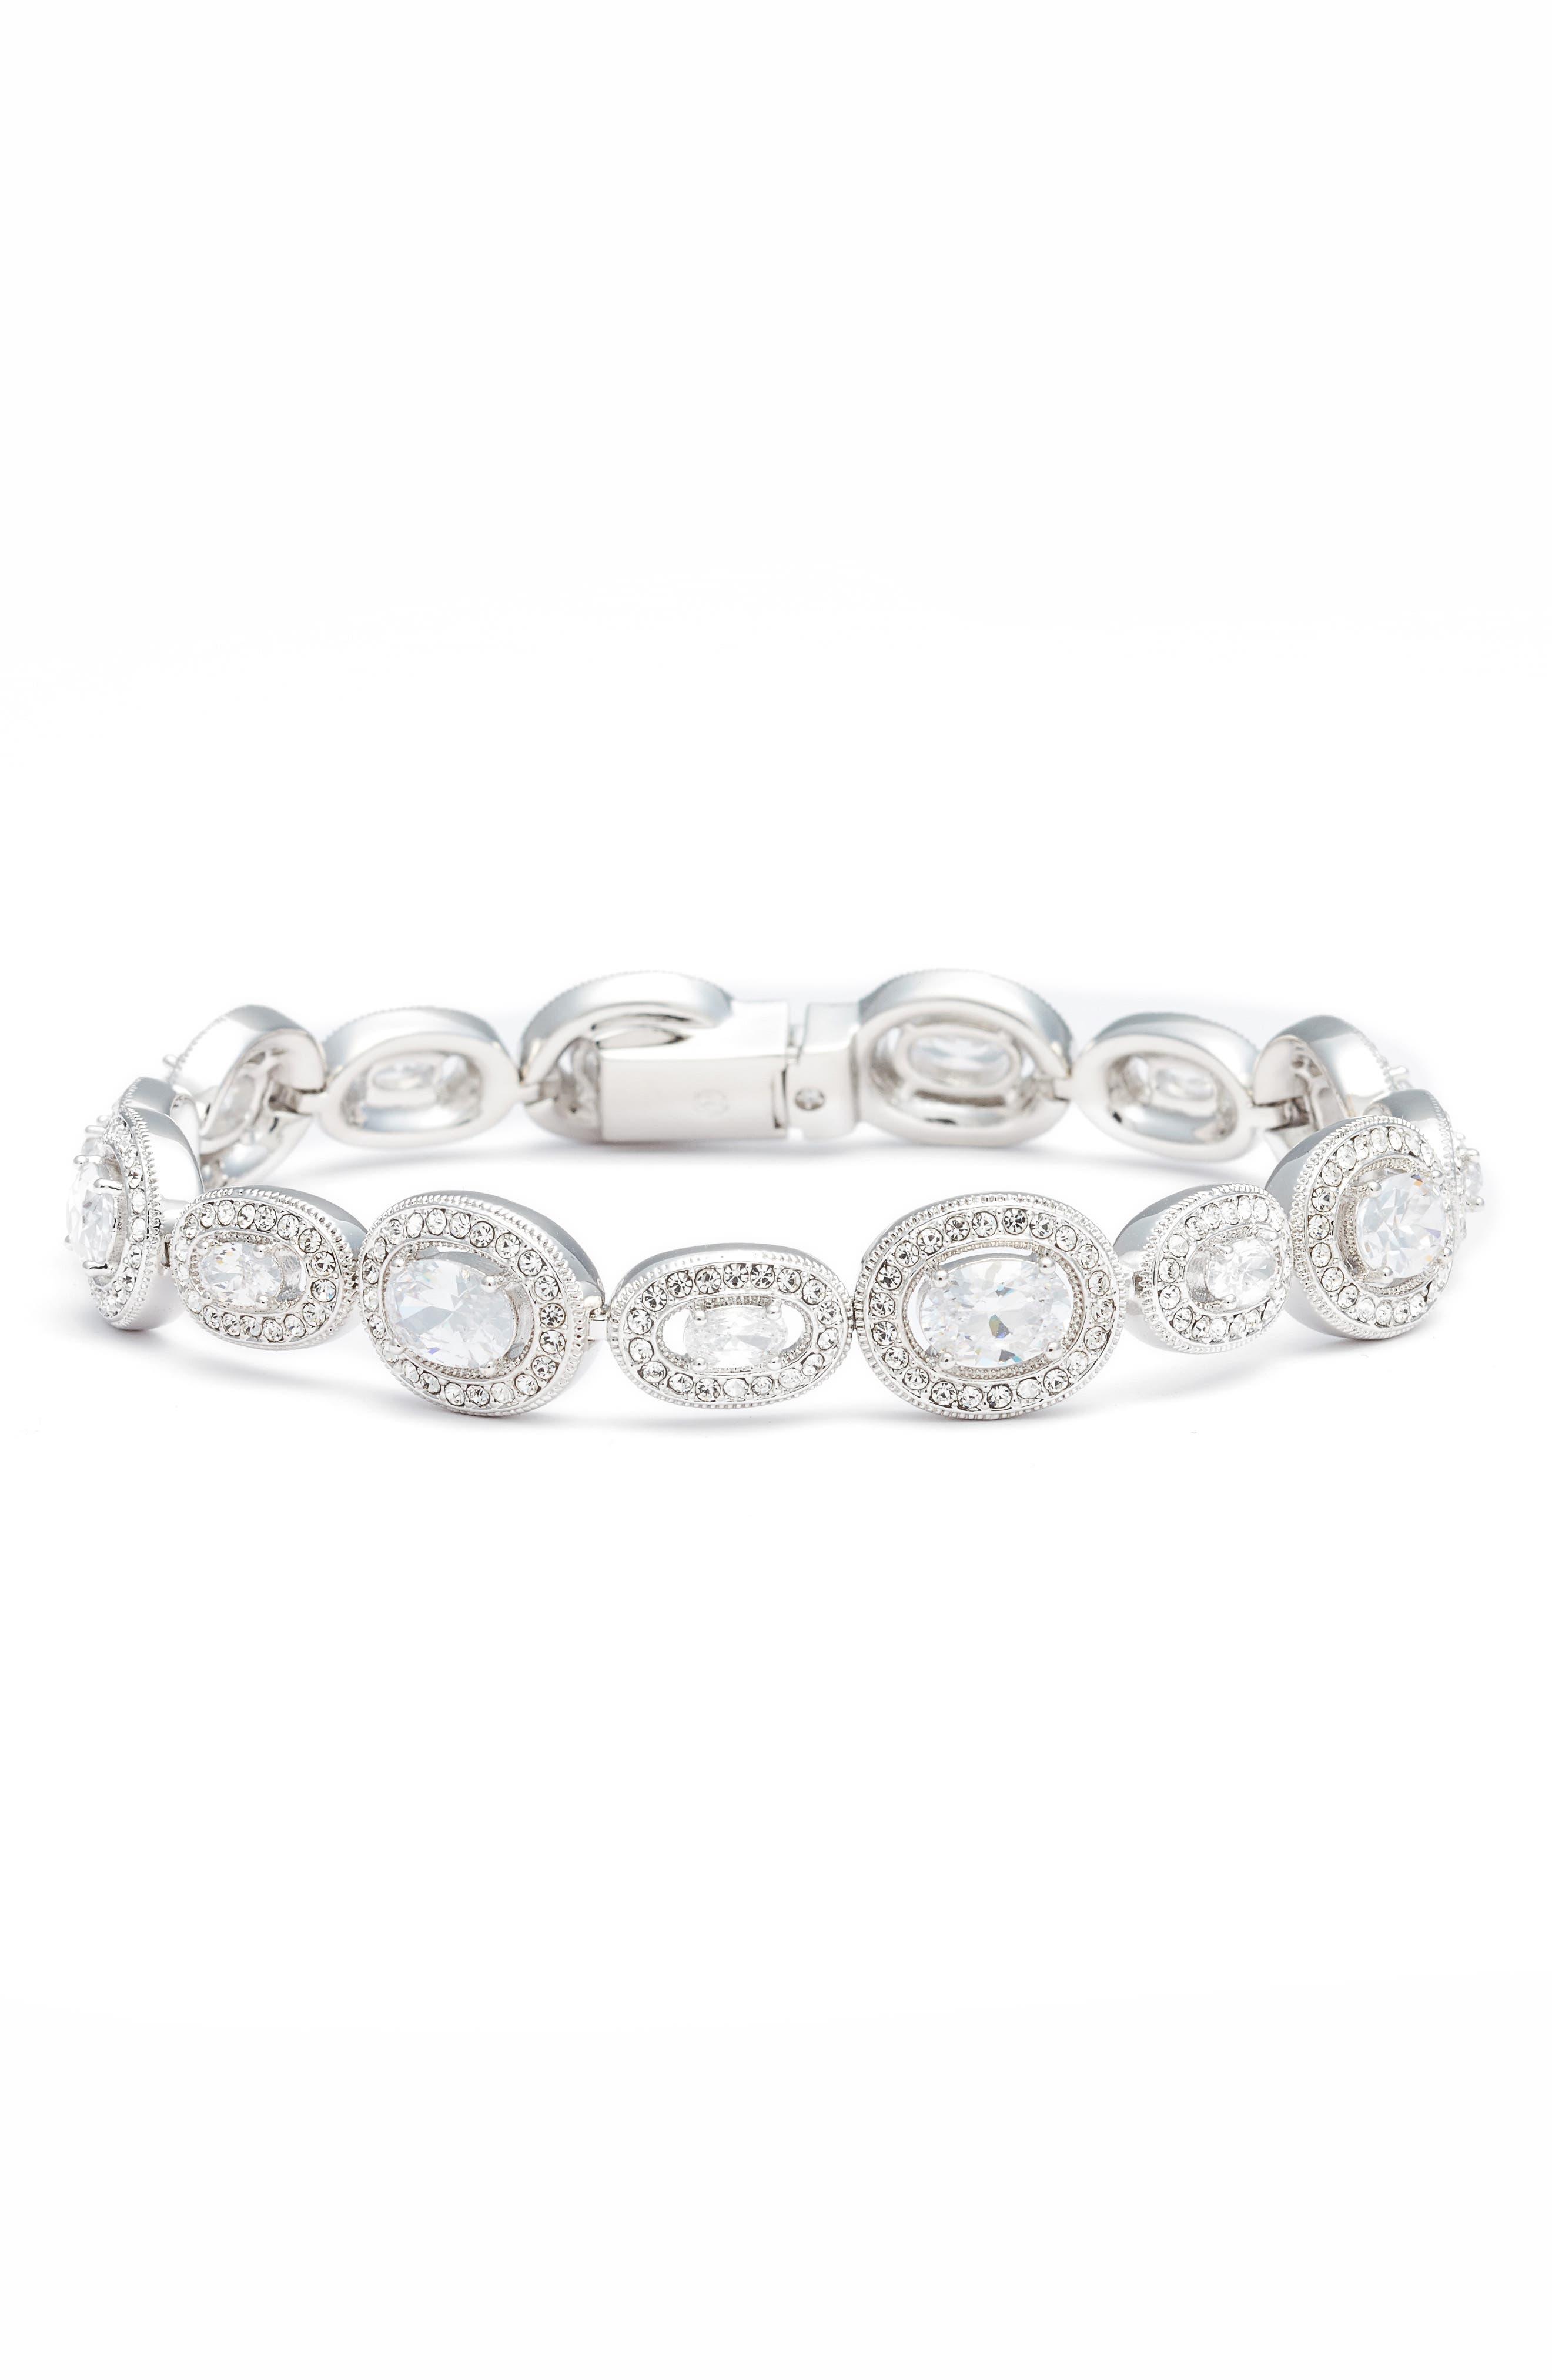 Marina Line Bracelet,                         Main,                         color, Silver